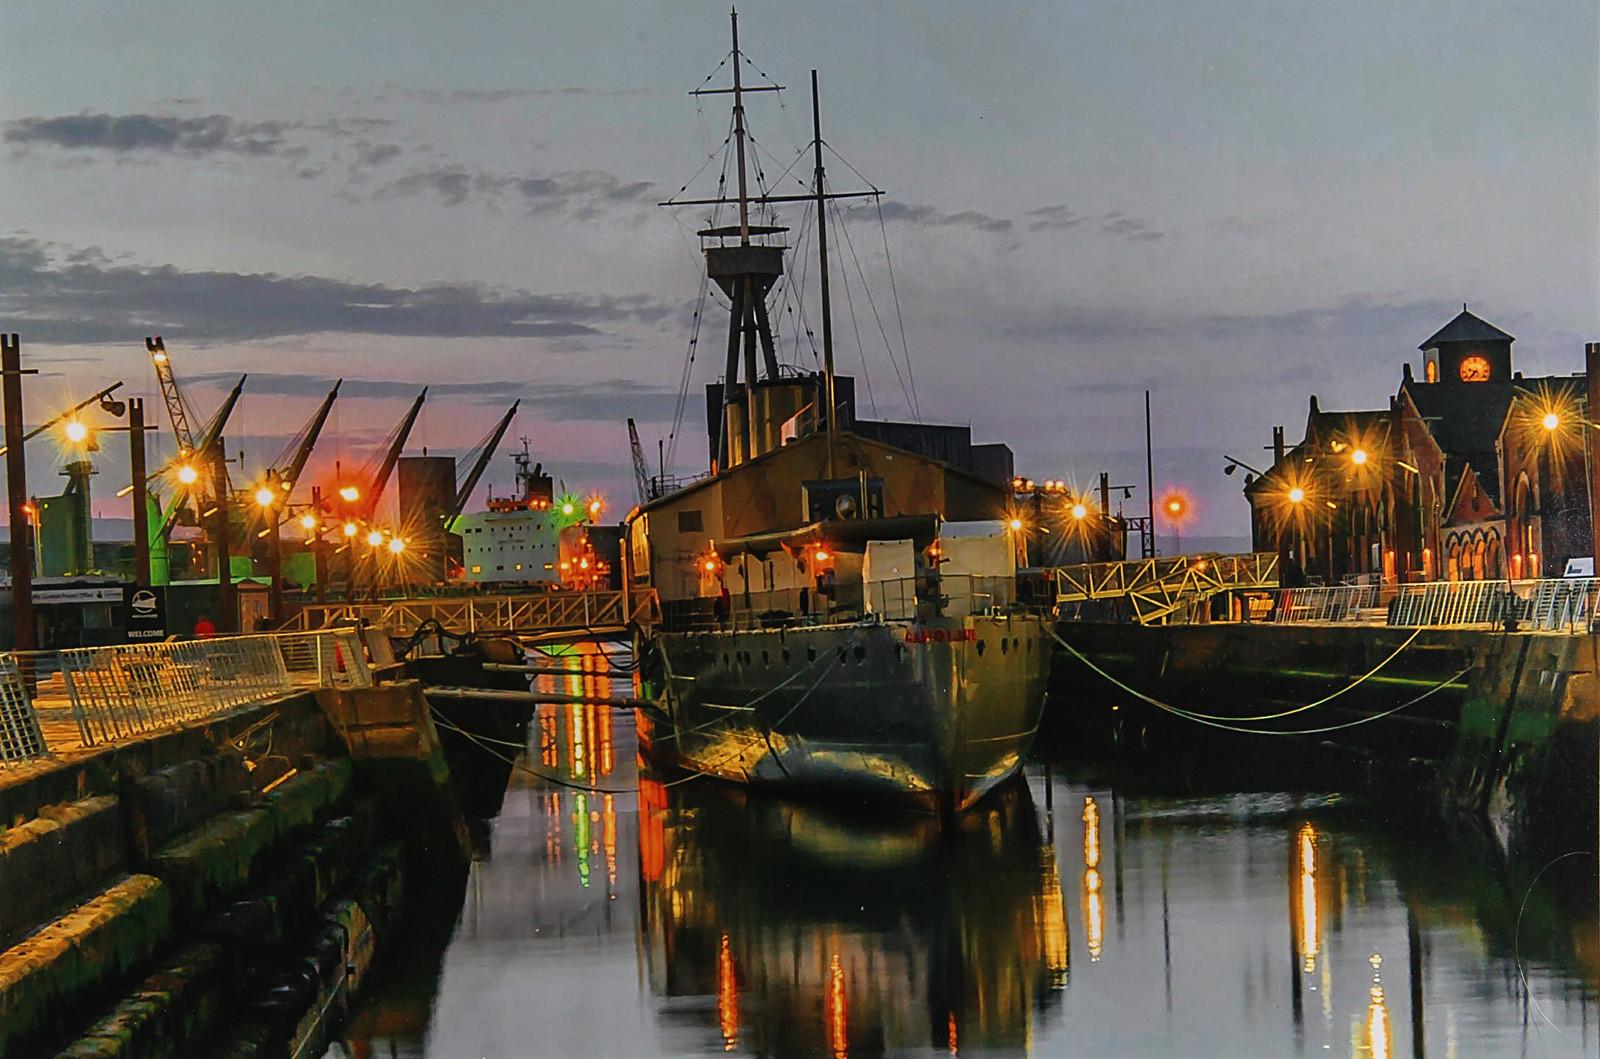 COLOUR - Sweet Caroline - Neil Diamond by David McClements (11 marks)